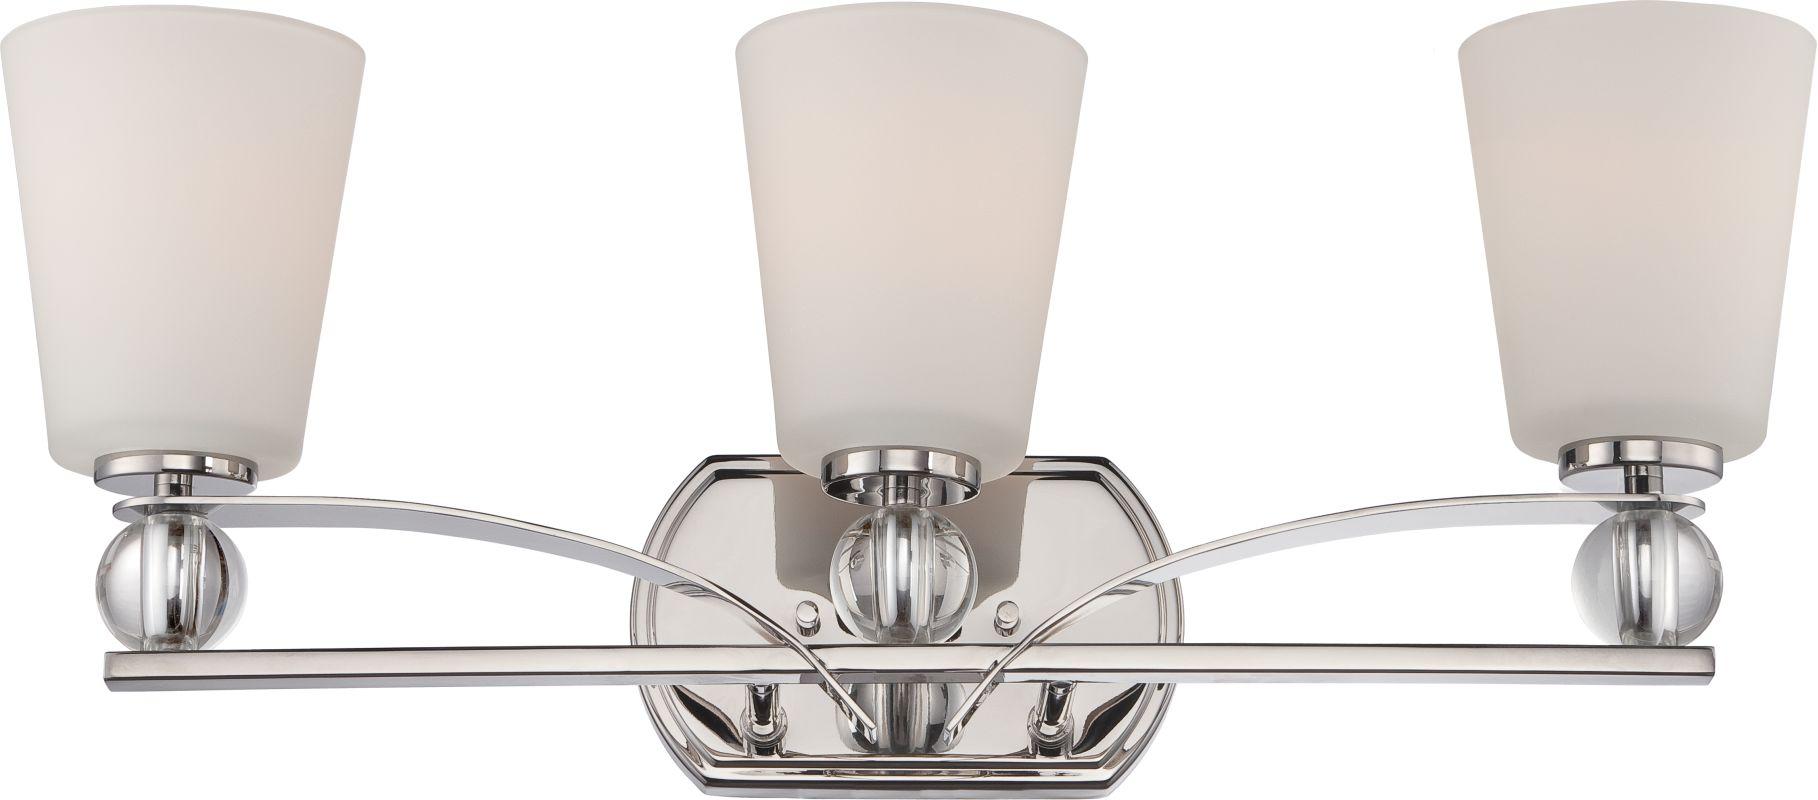 Nuvo Lighting 60/5493 Connie 3 Light Bathroom Vanity Light Polished